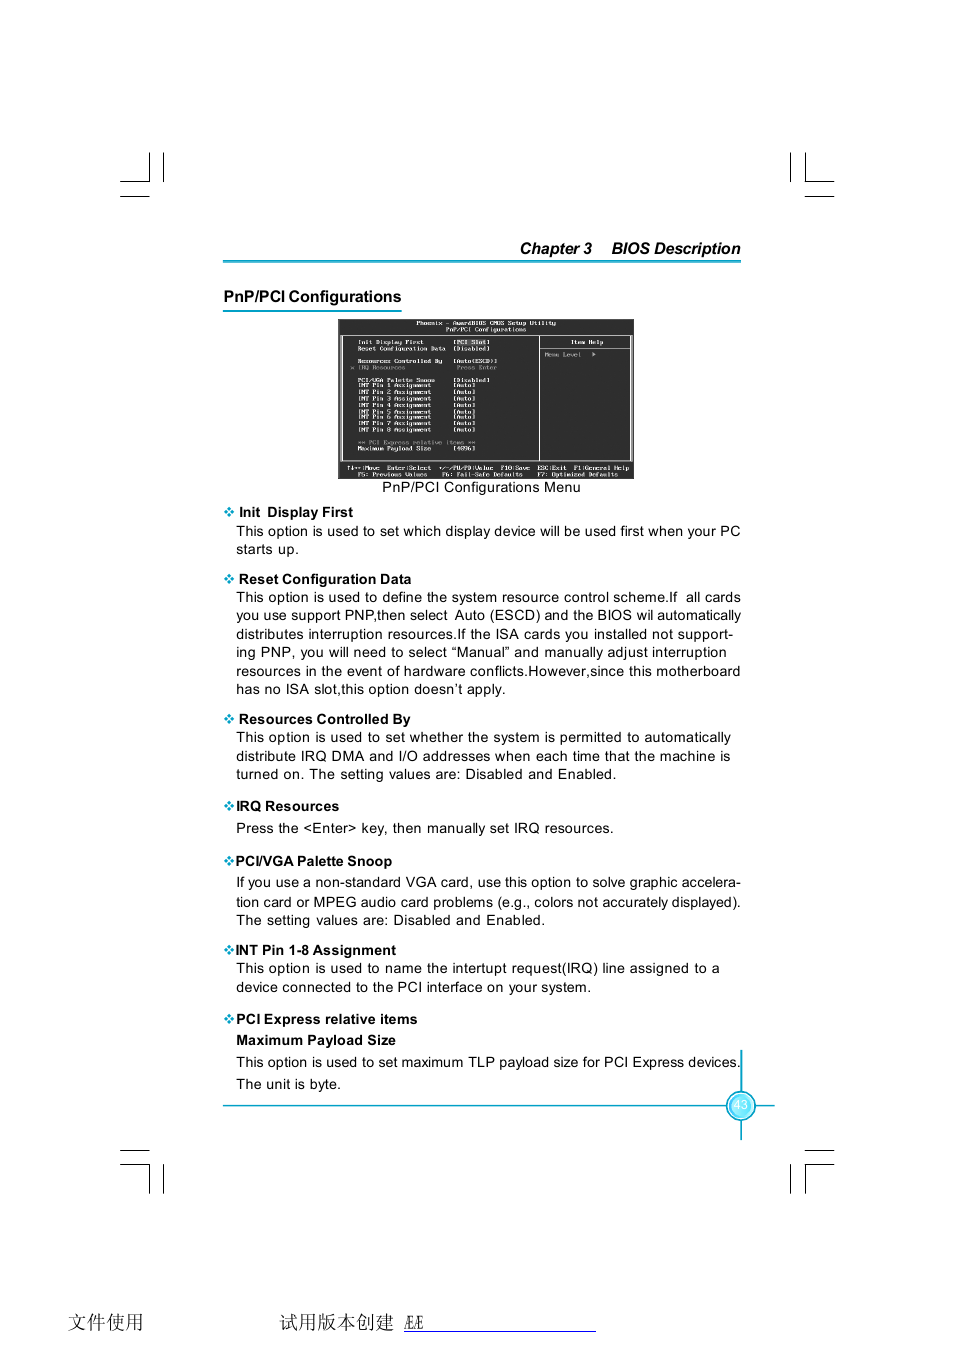 Rice university creative writing notes pdf